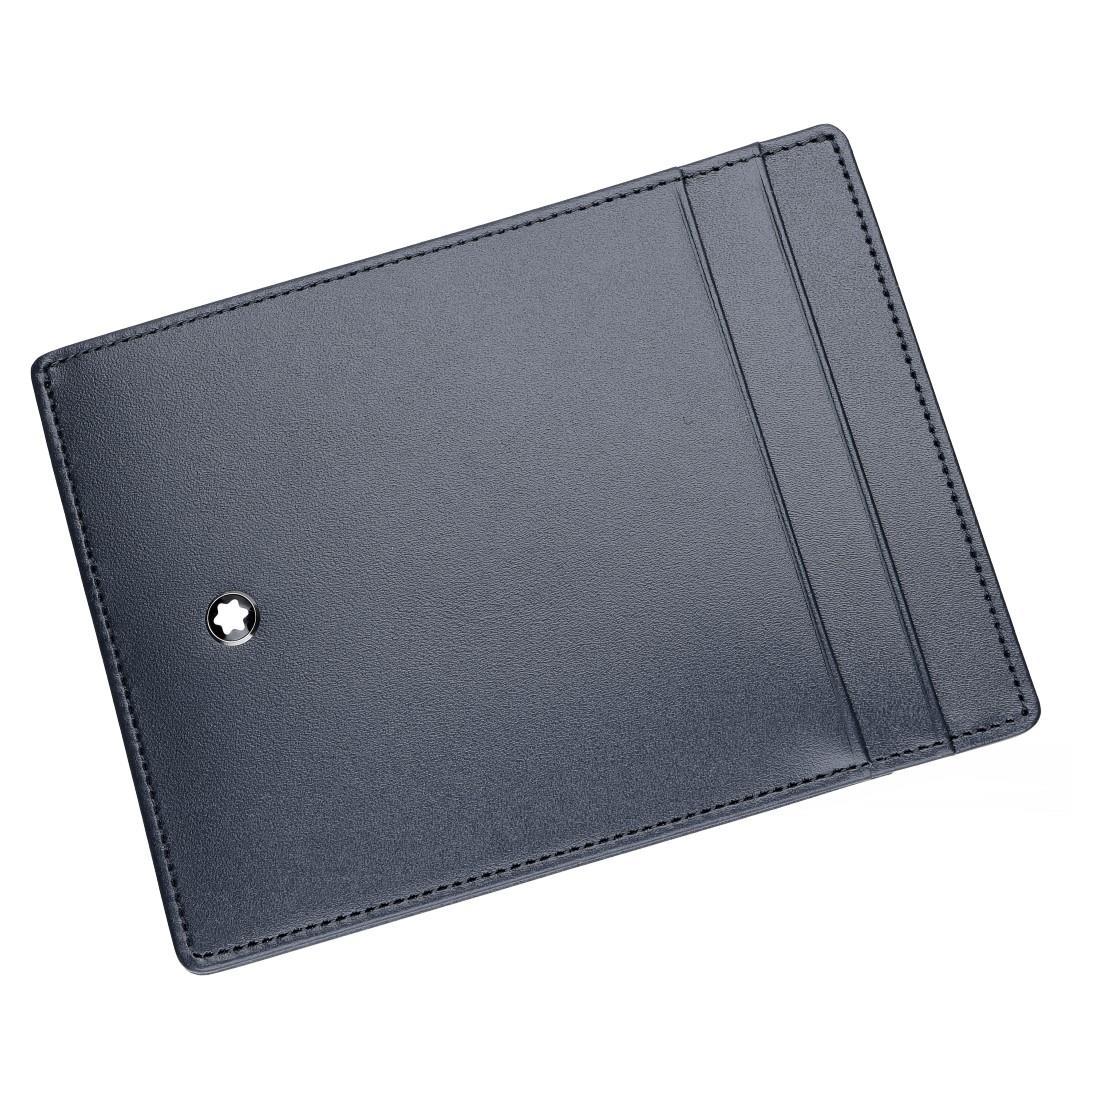 Porta carte tascabile 4 scomparti Meisterstück con portadocumento - MONTBLANC